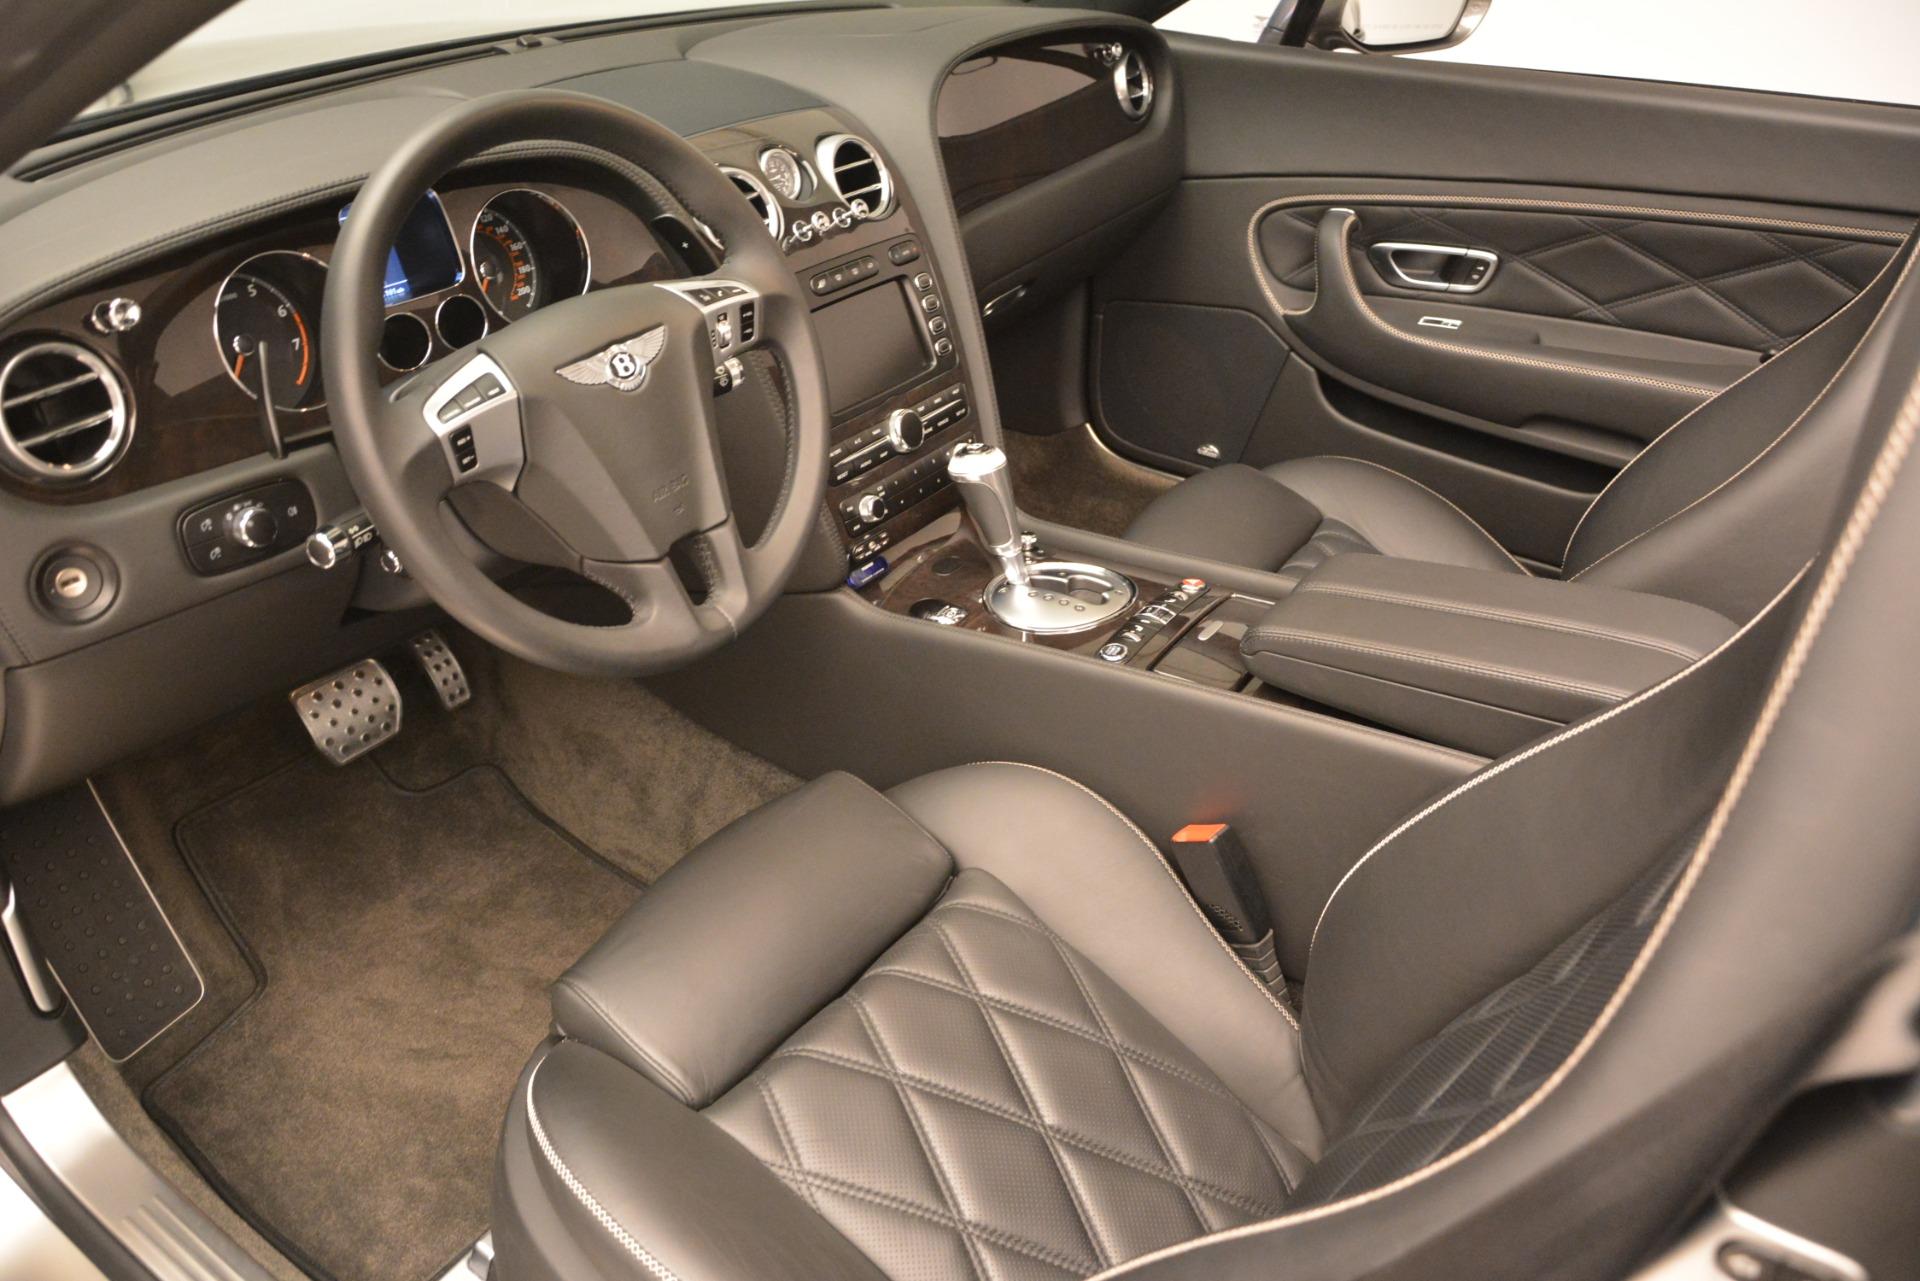 Used 2010 Bentley Continental GT Speed For Sale In Westport, CT 2677_p22